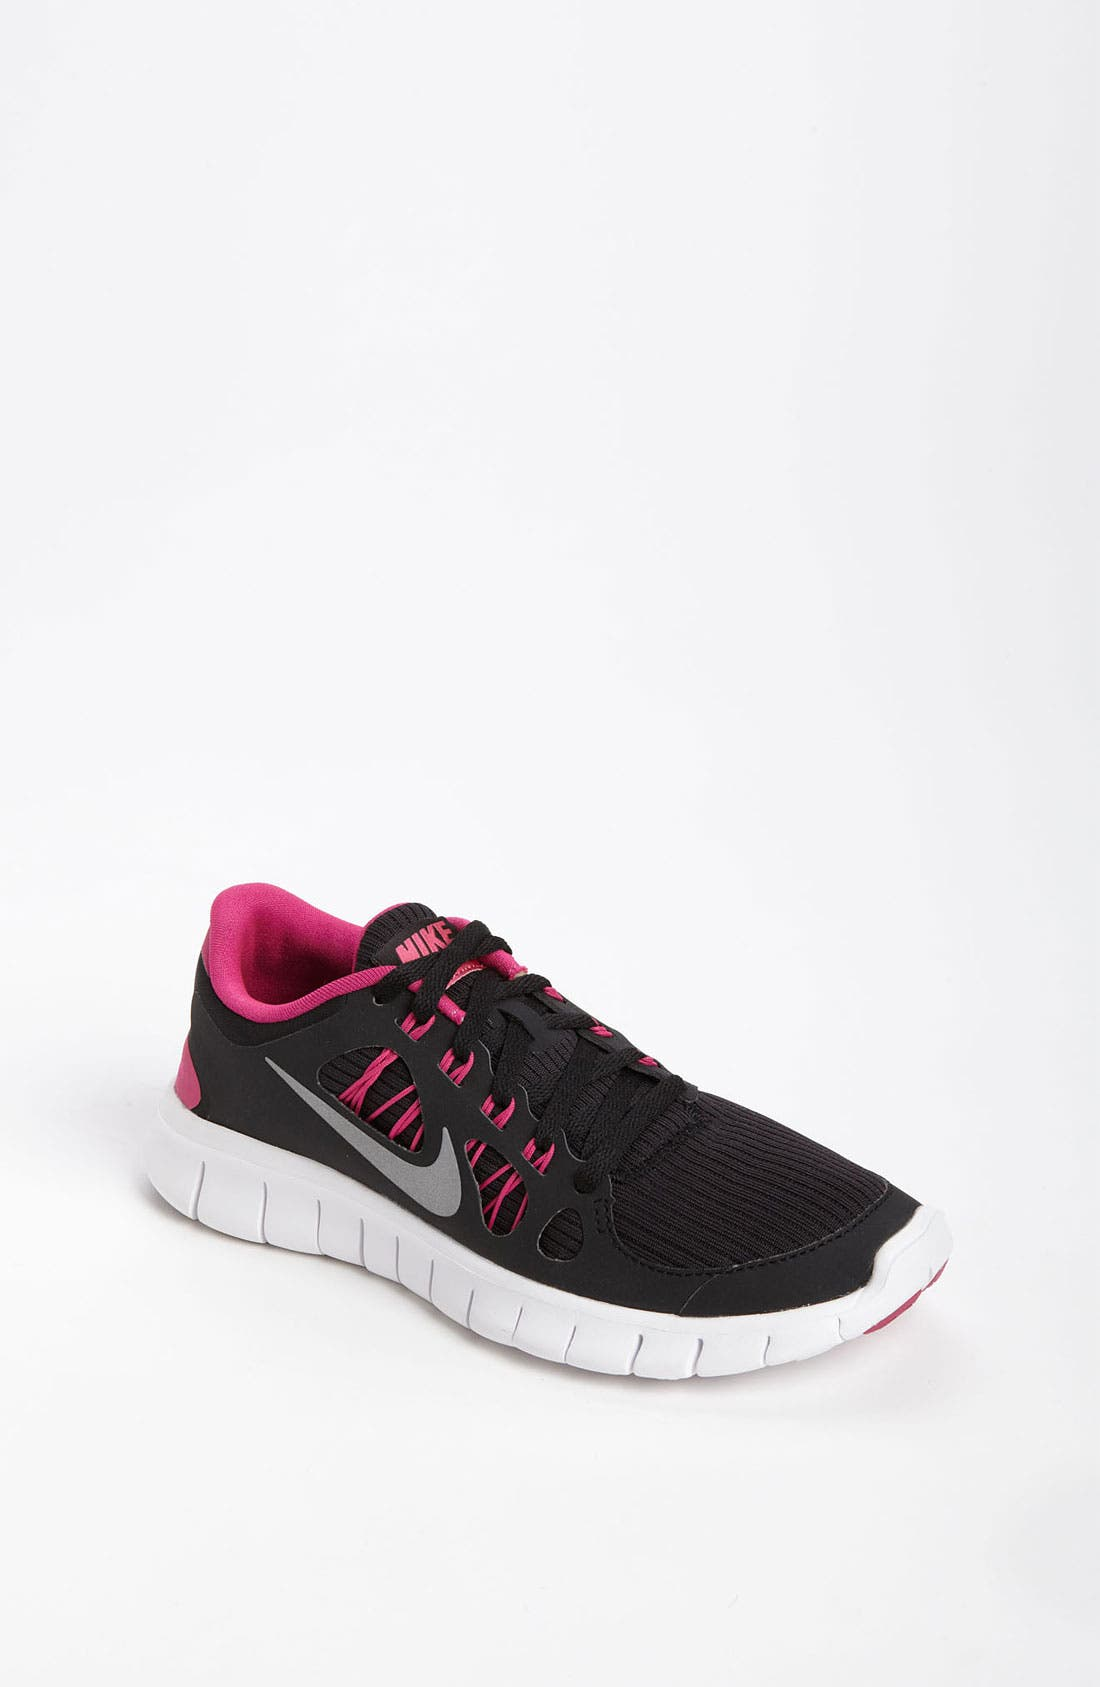 Main Image - Nike 'Free Run 5.0' Sneaker (Big Kid)